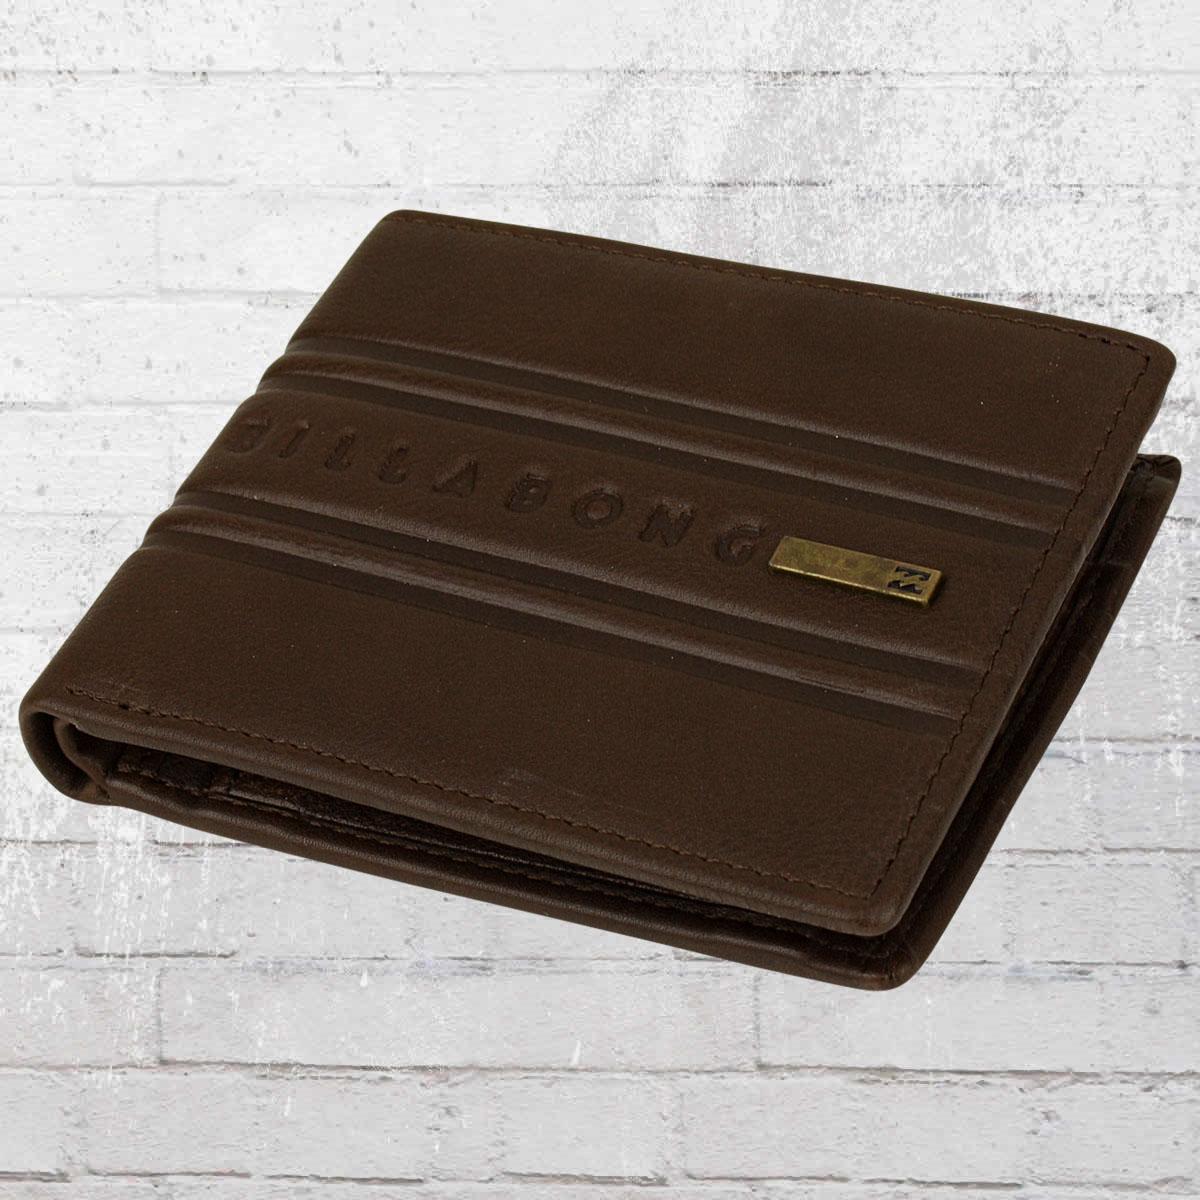 1b3e723c1009f Billabong Leder Portemonnaie Phoenix Wallet braun. ›‹ «